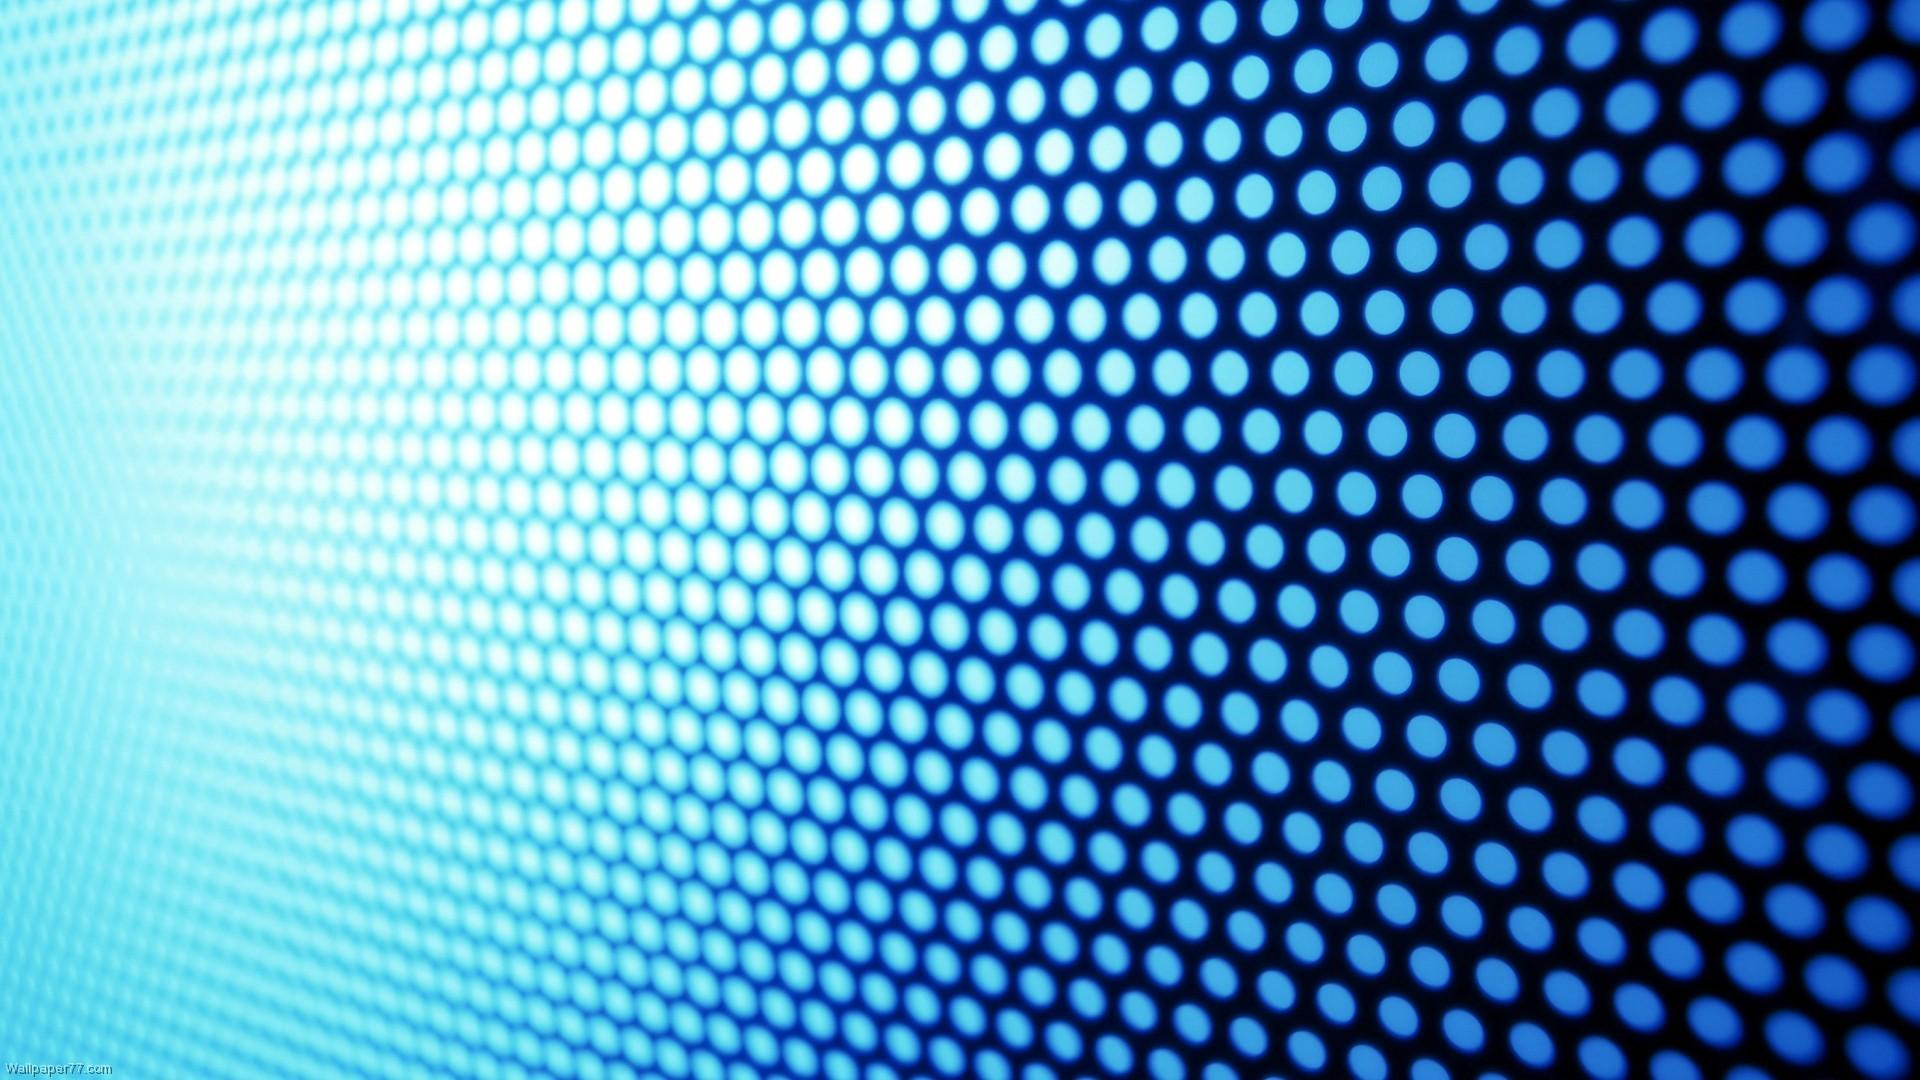 Blue Pattern Background wallpaper – 689013